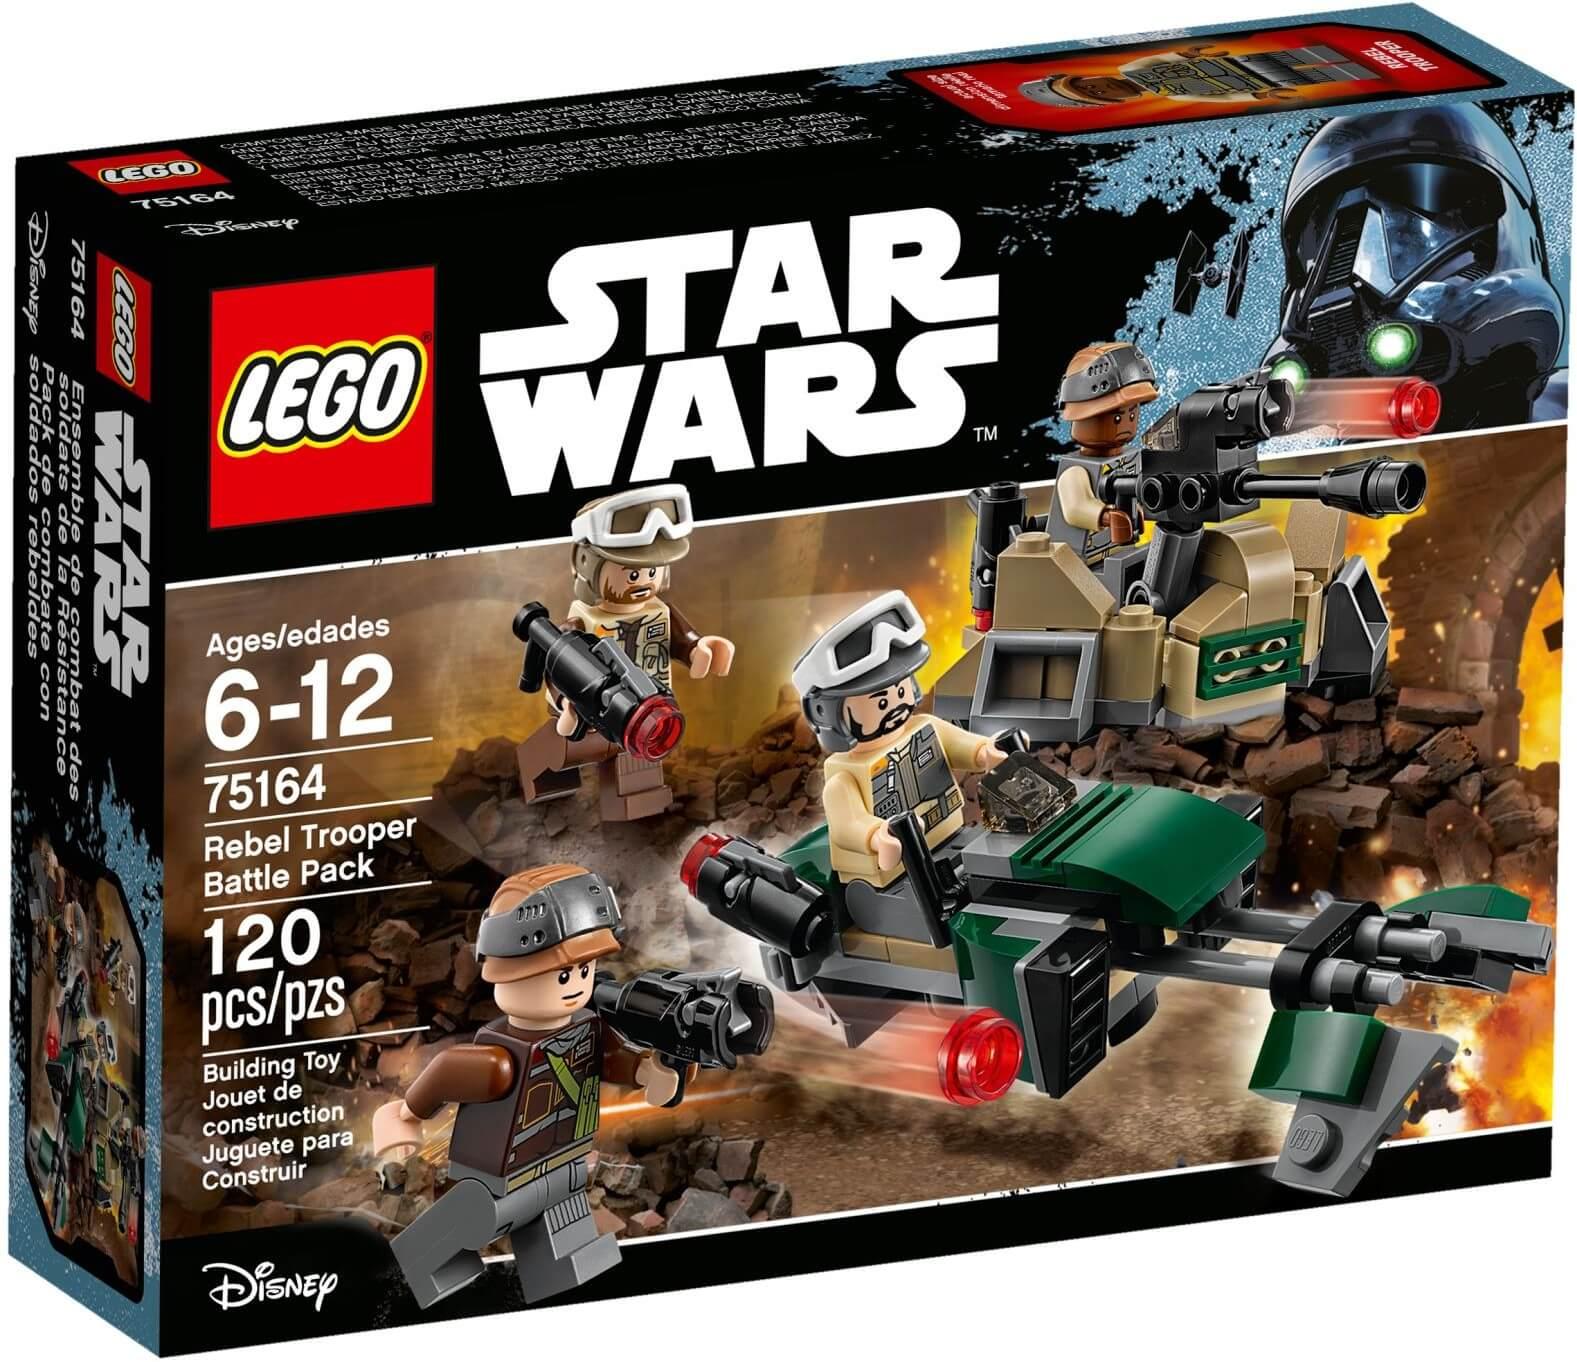 Mua đồ chơi LEGO 75164 - LEGO Star Wars 75164 - Đội Đặc Nhiệm Rebel (LEGO 75164 Rebel Trooper Battle Pack)